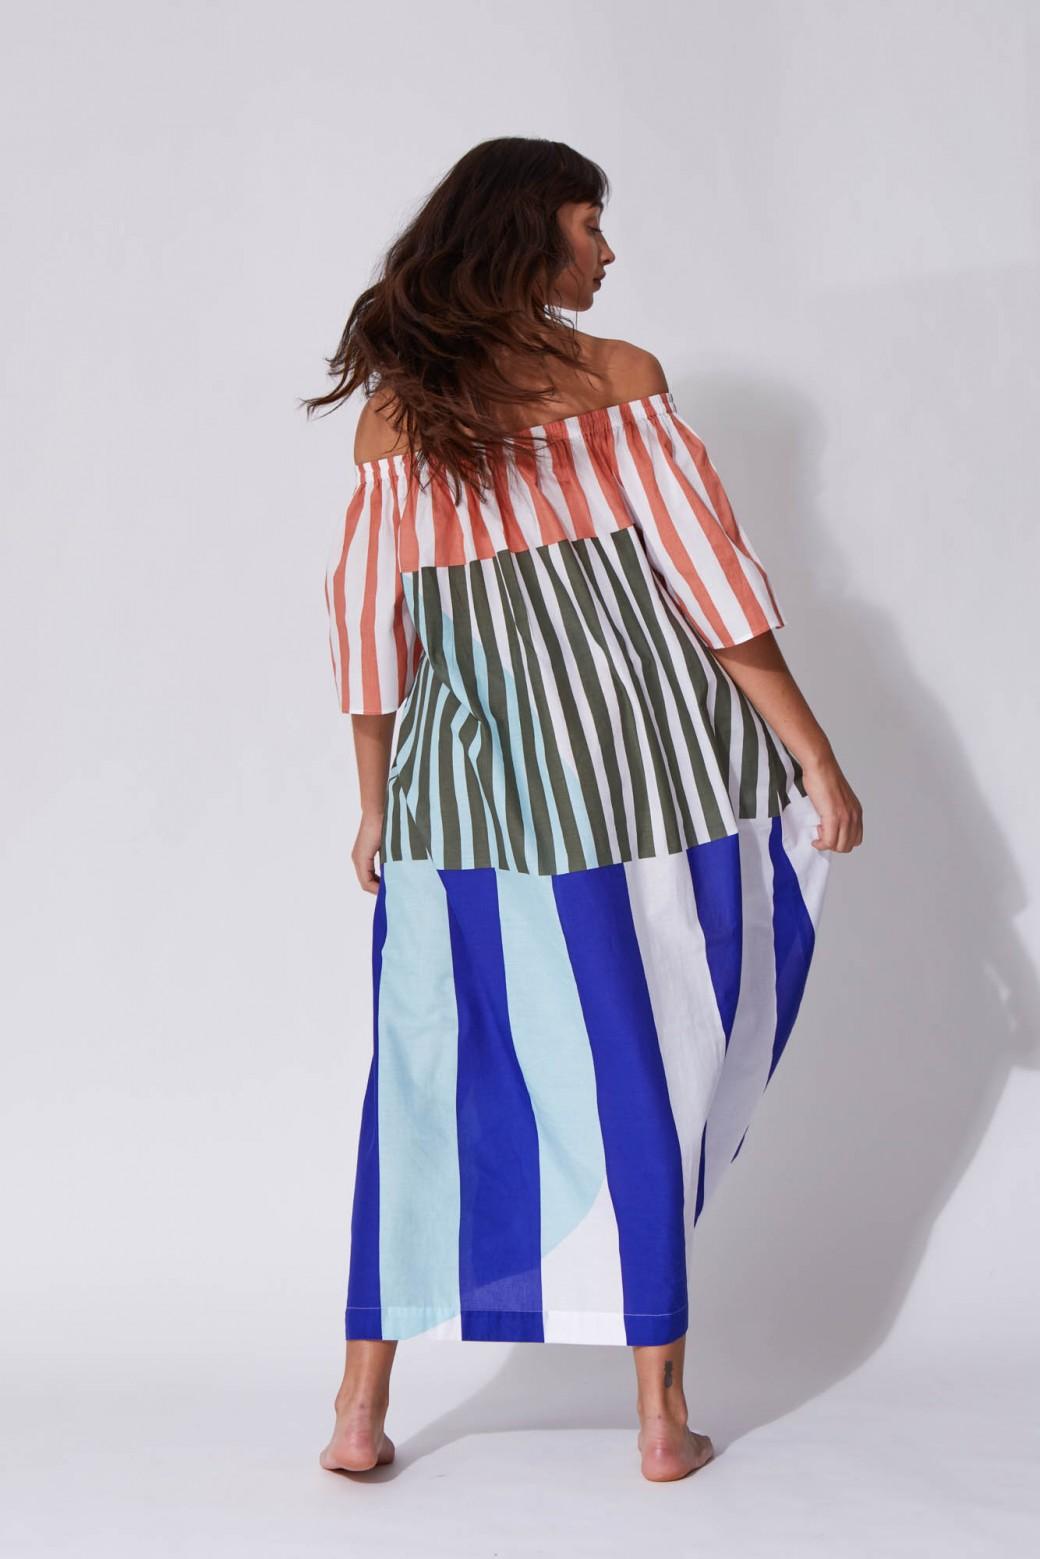 Palao Sol Ultraviolet Dress